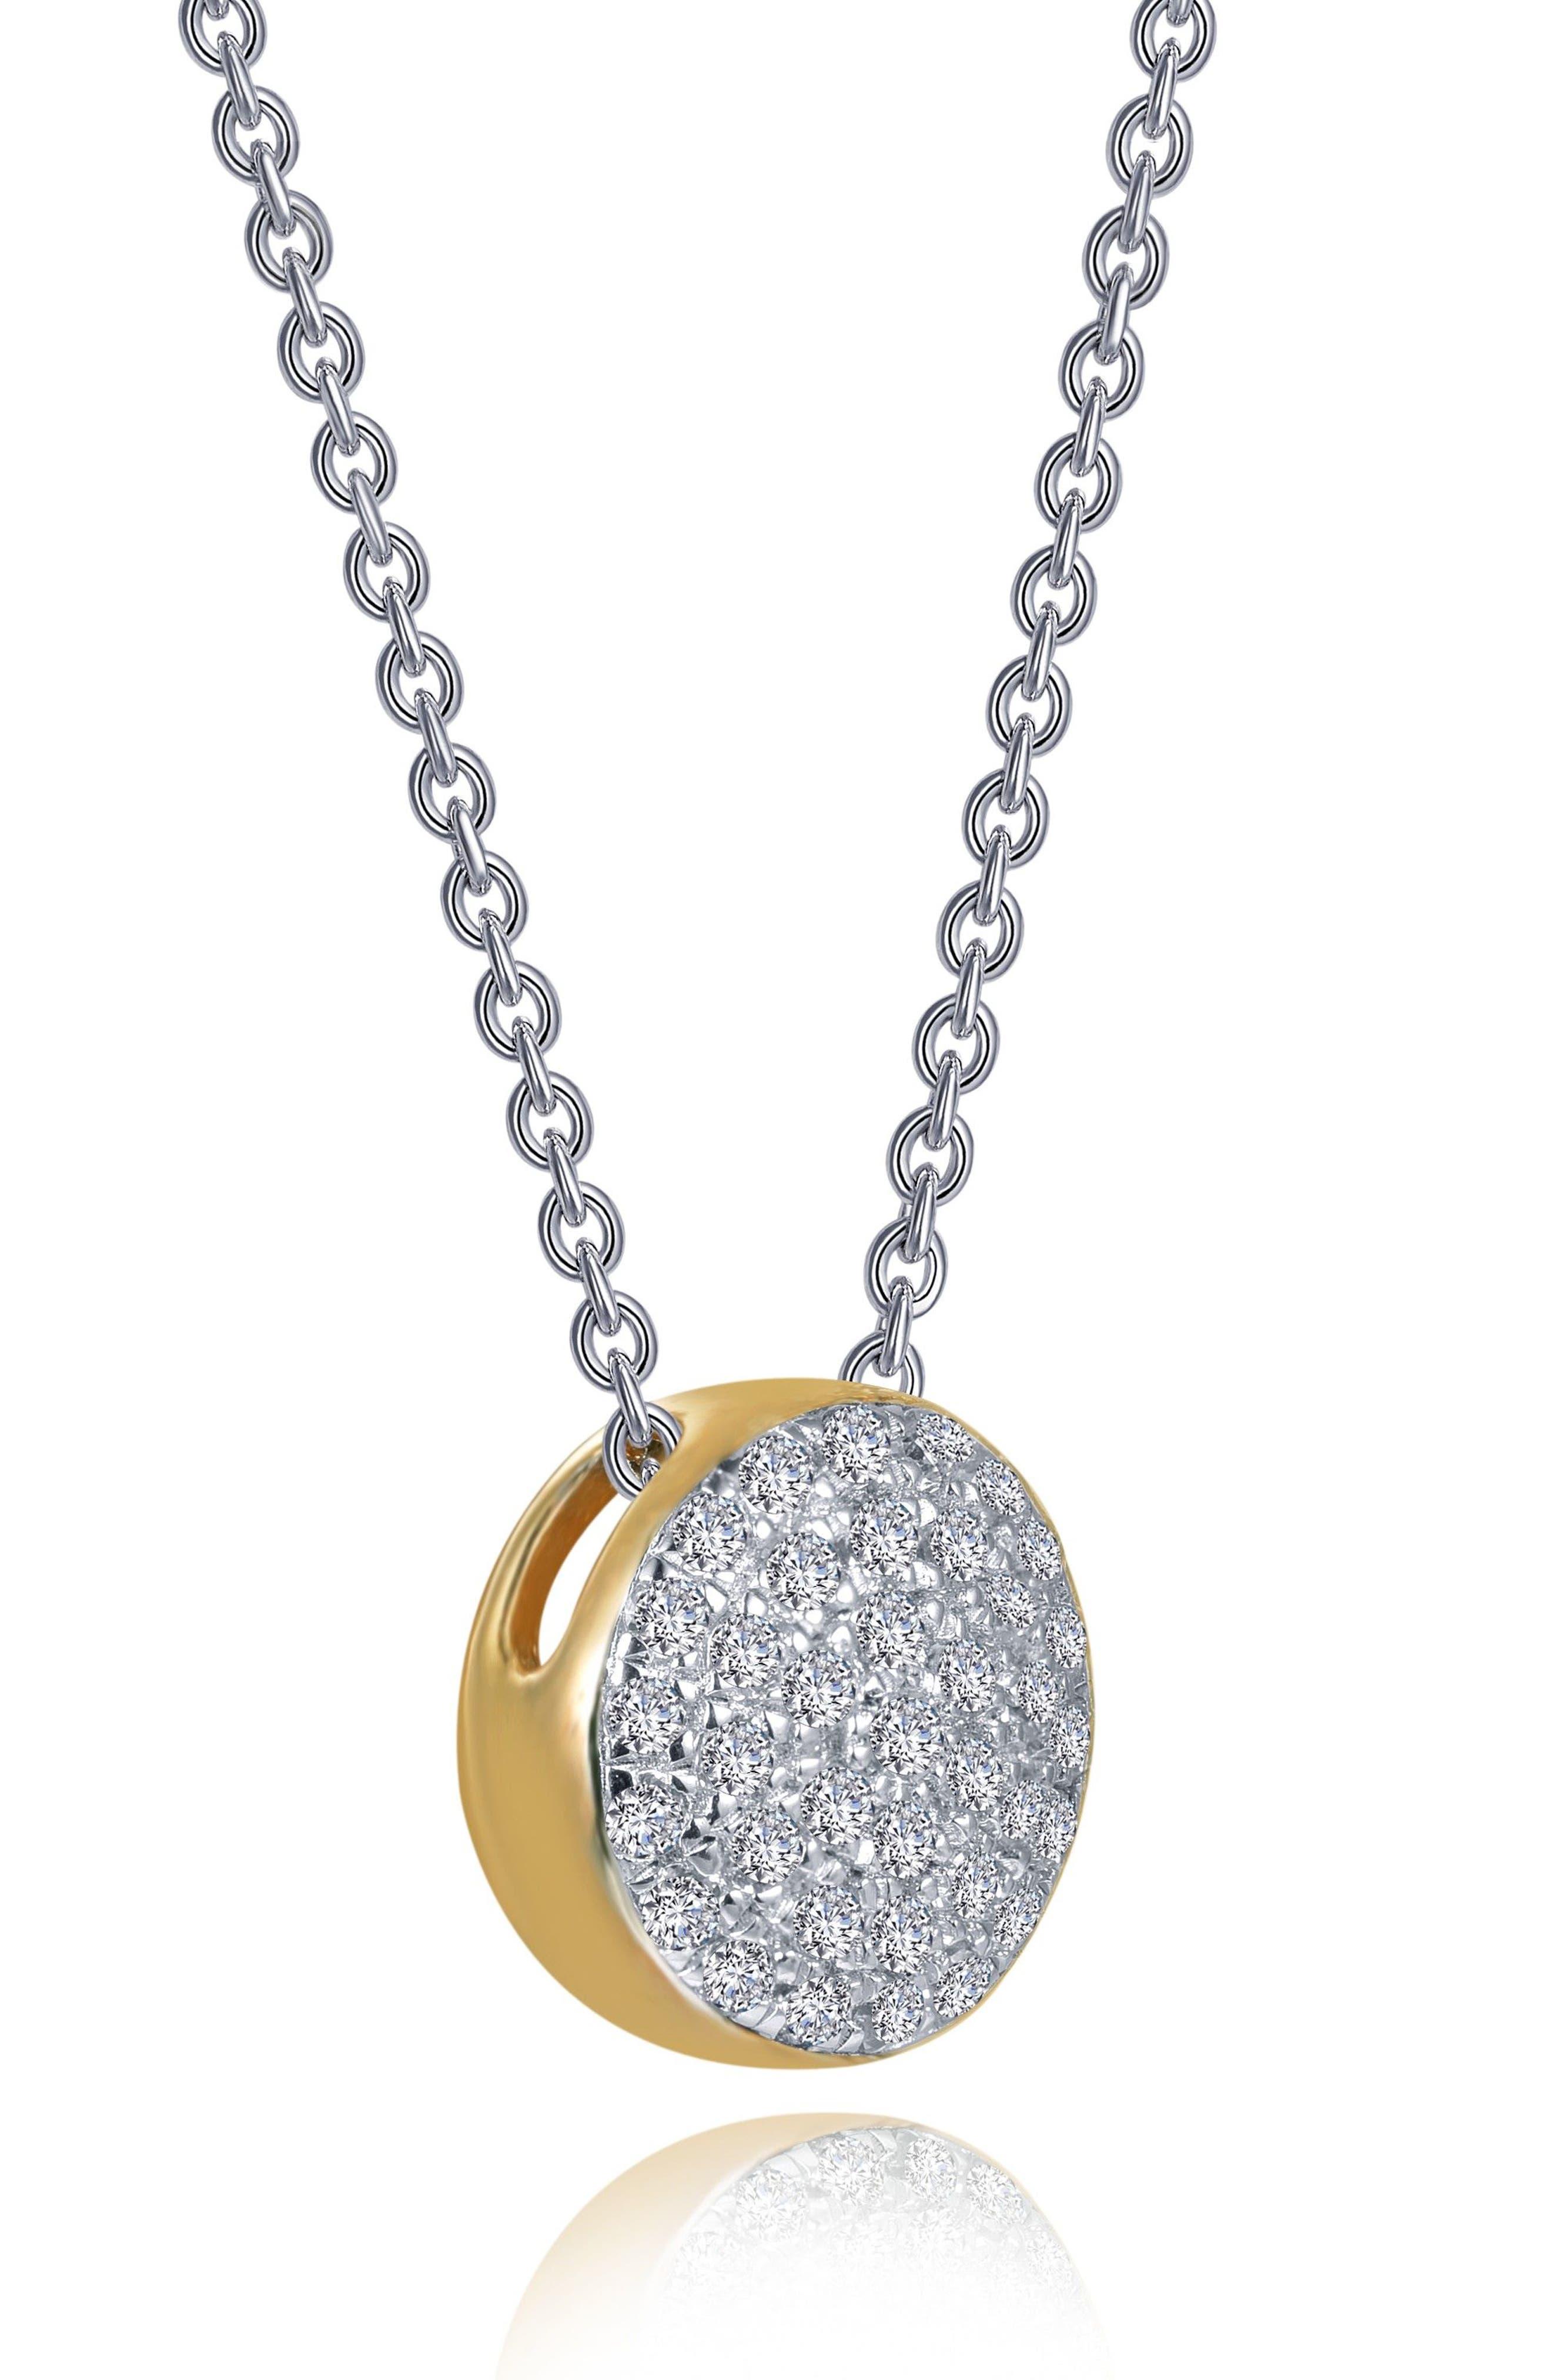 Two-Tone Pavé Button Choker Necklace,                             Main thumbnail 1, color,                             Silver/ Gold/ Clear